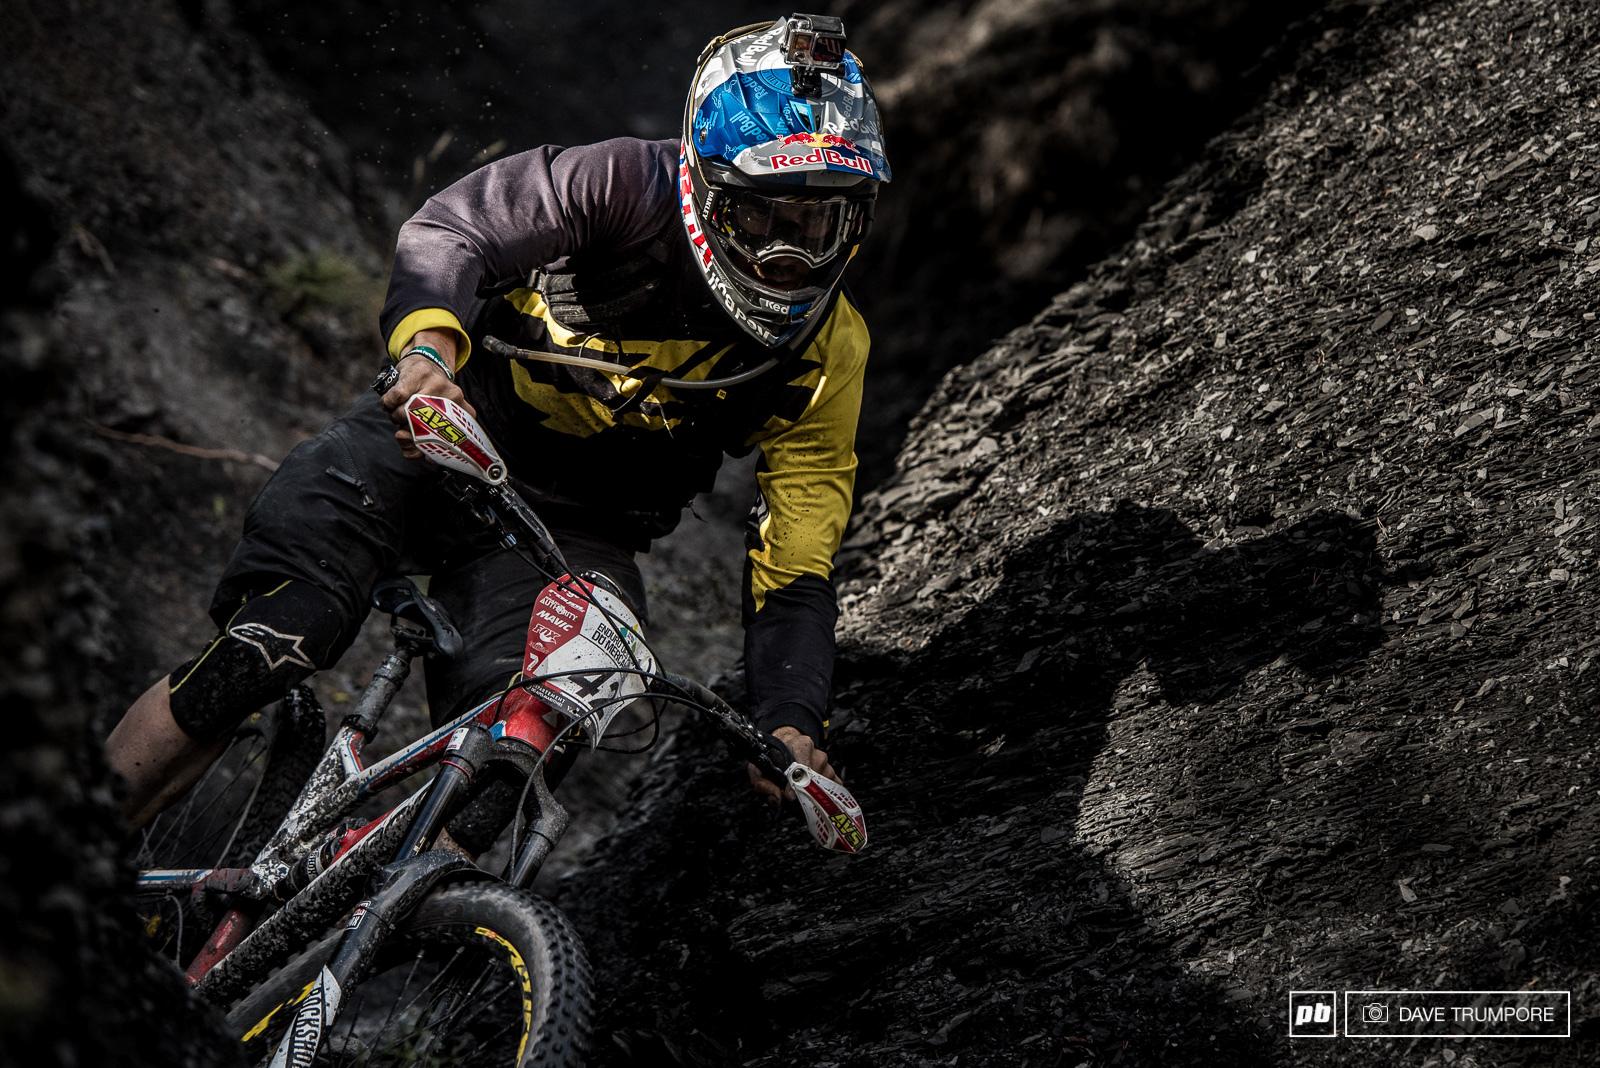 Matti Lehikoinen threads it through the last canyon of grey earth in stage 4.